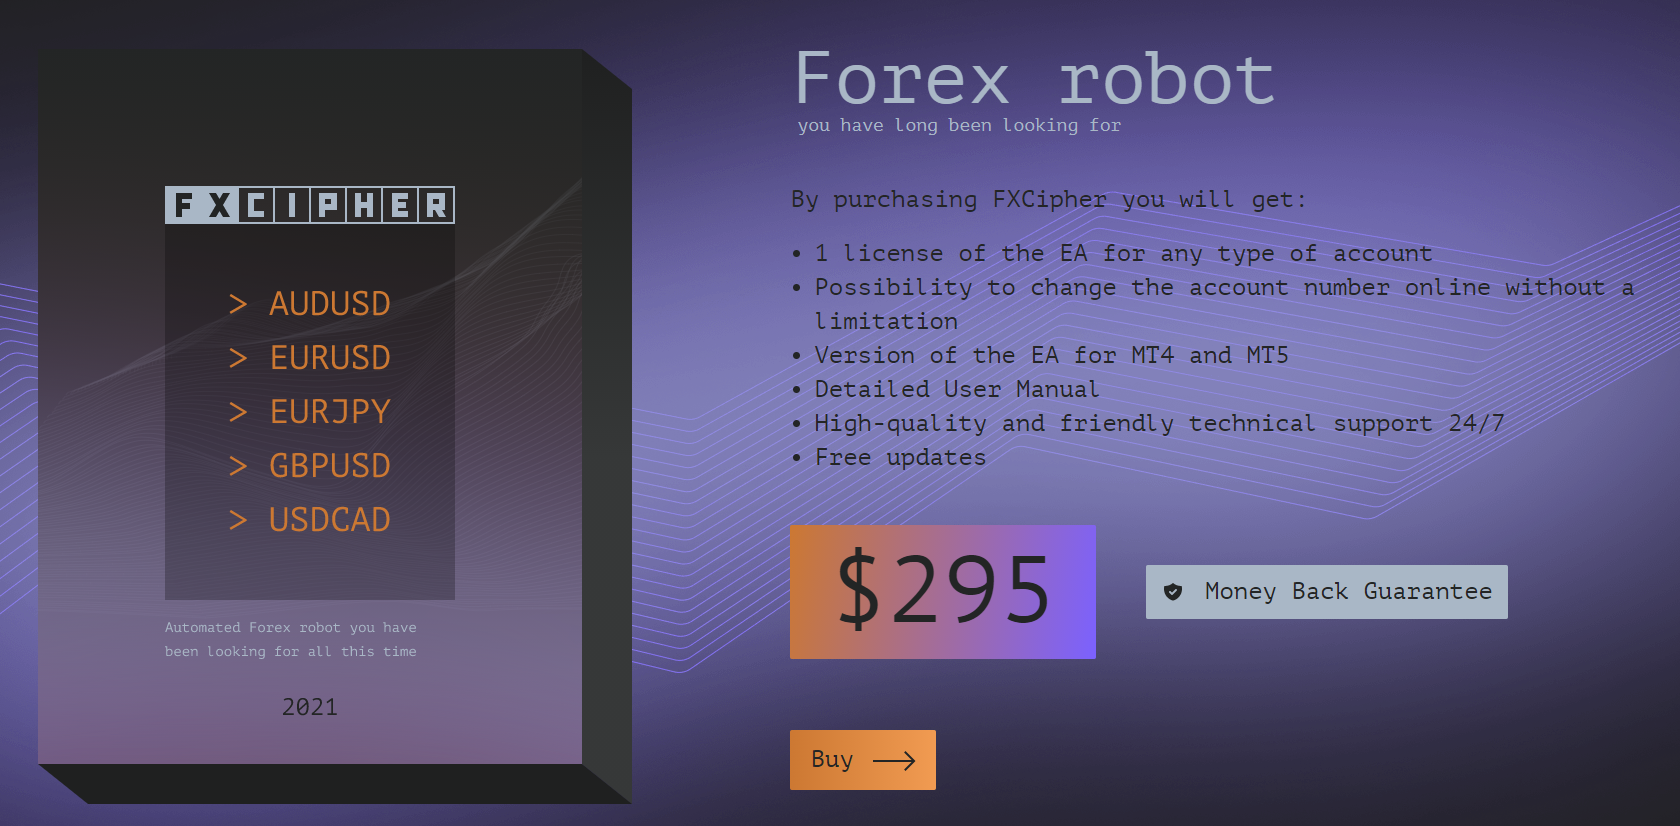 FXCipher pricing.